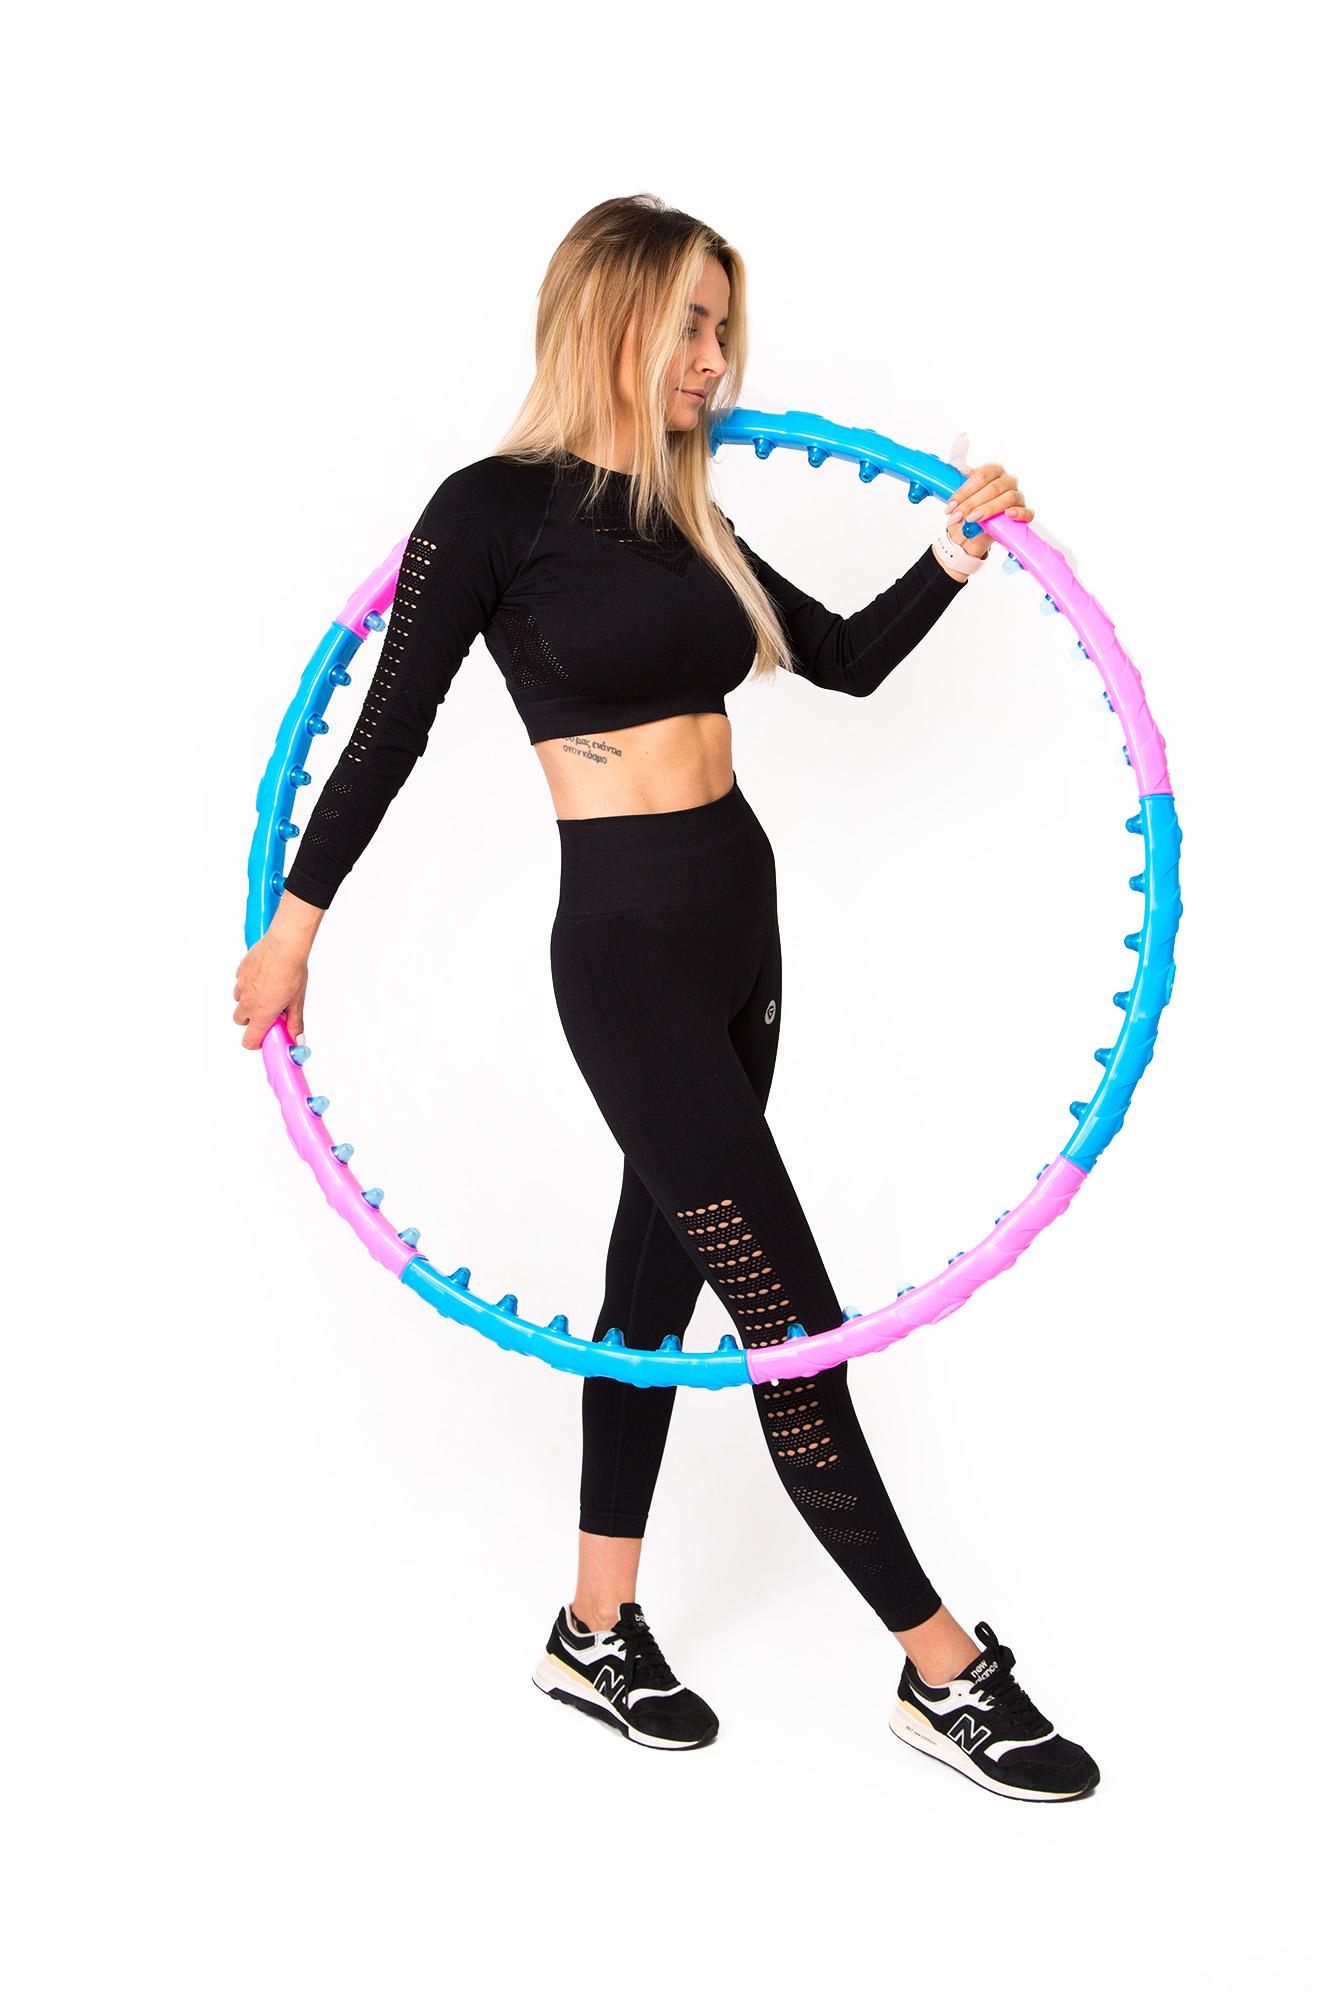 Odchudzające HulaHop Koło Składane Hula Hoop Masaż Marka Inna marka